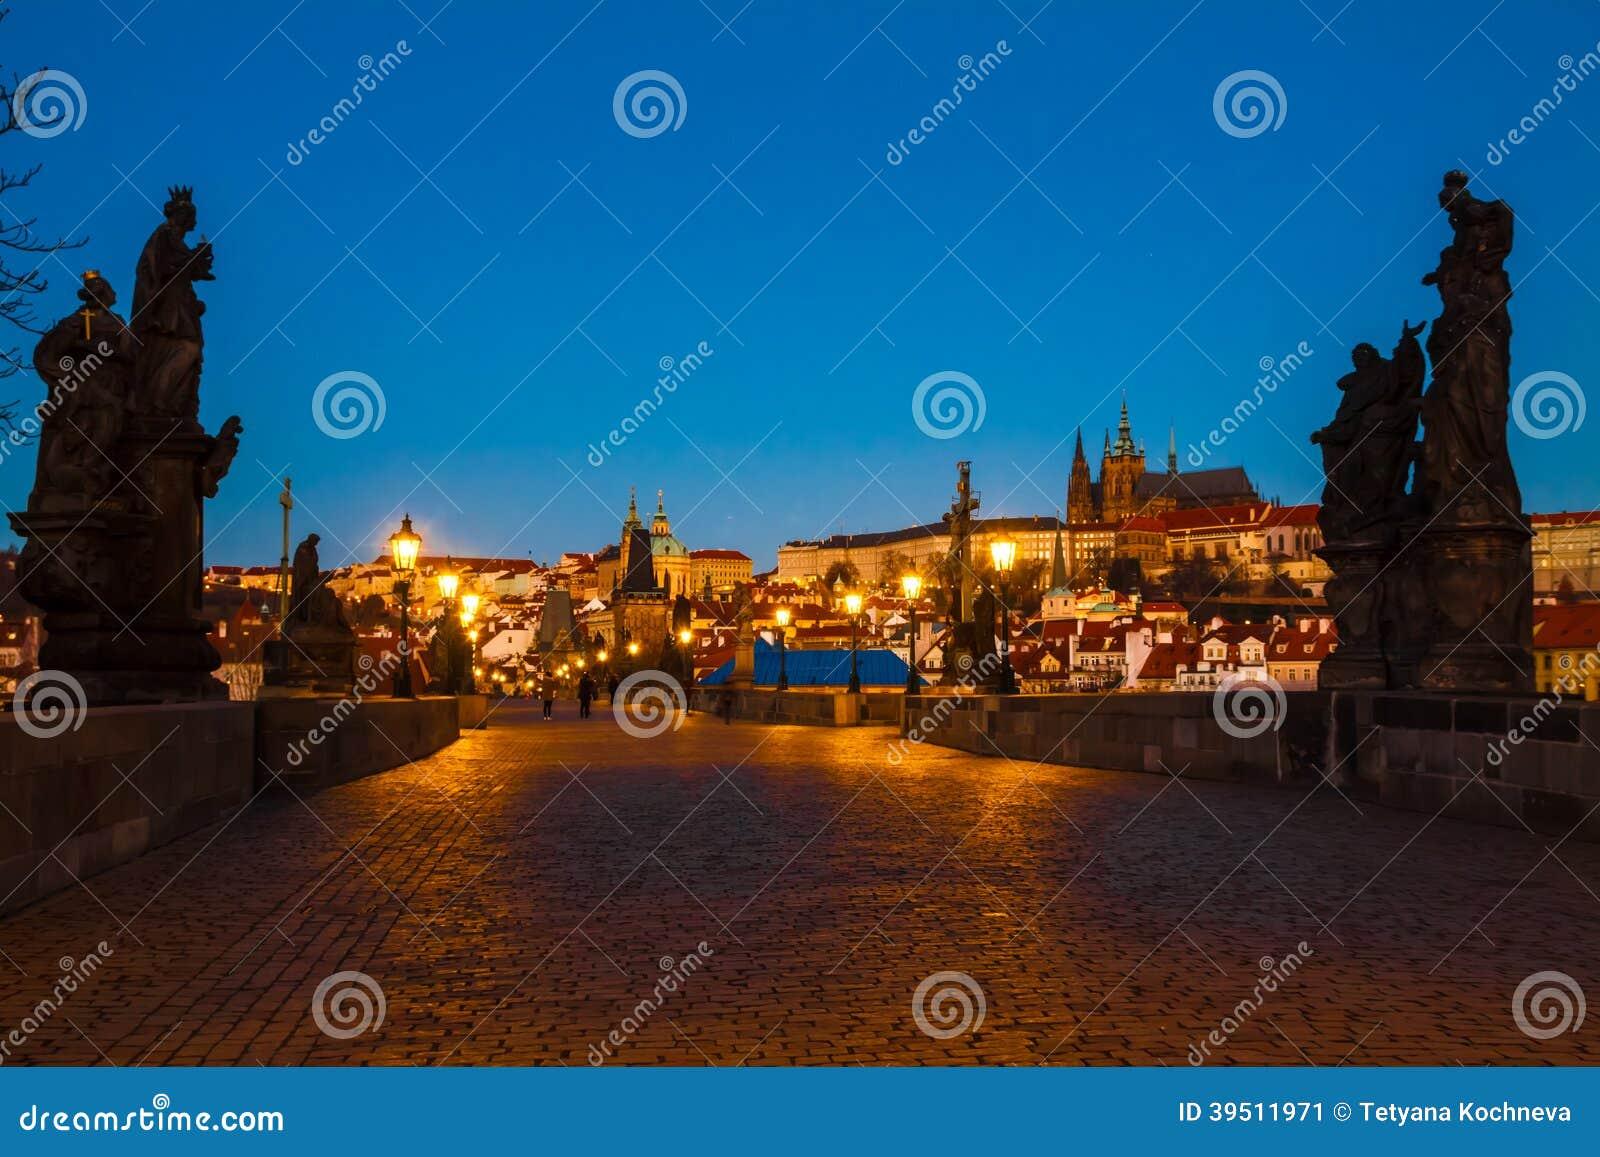 Prague Charles bridge in the morning